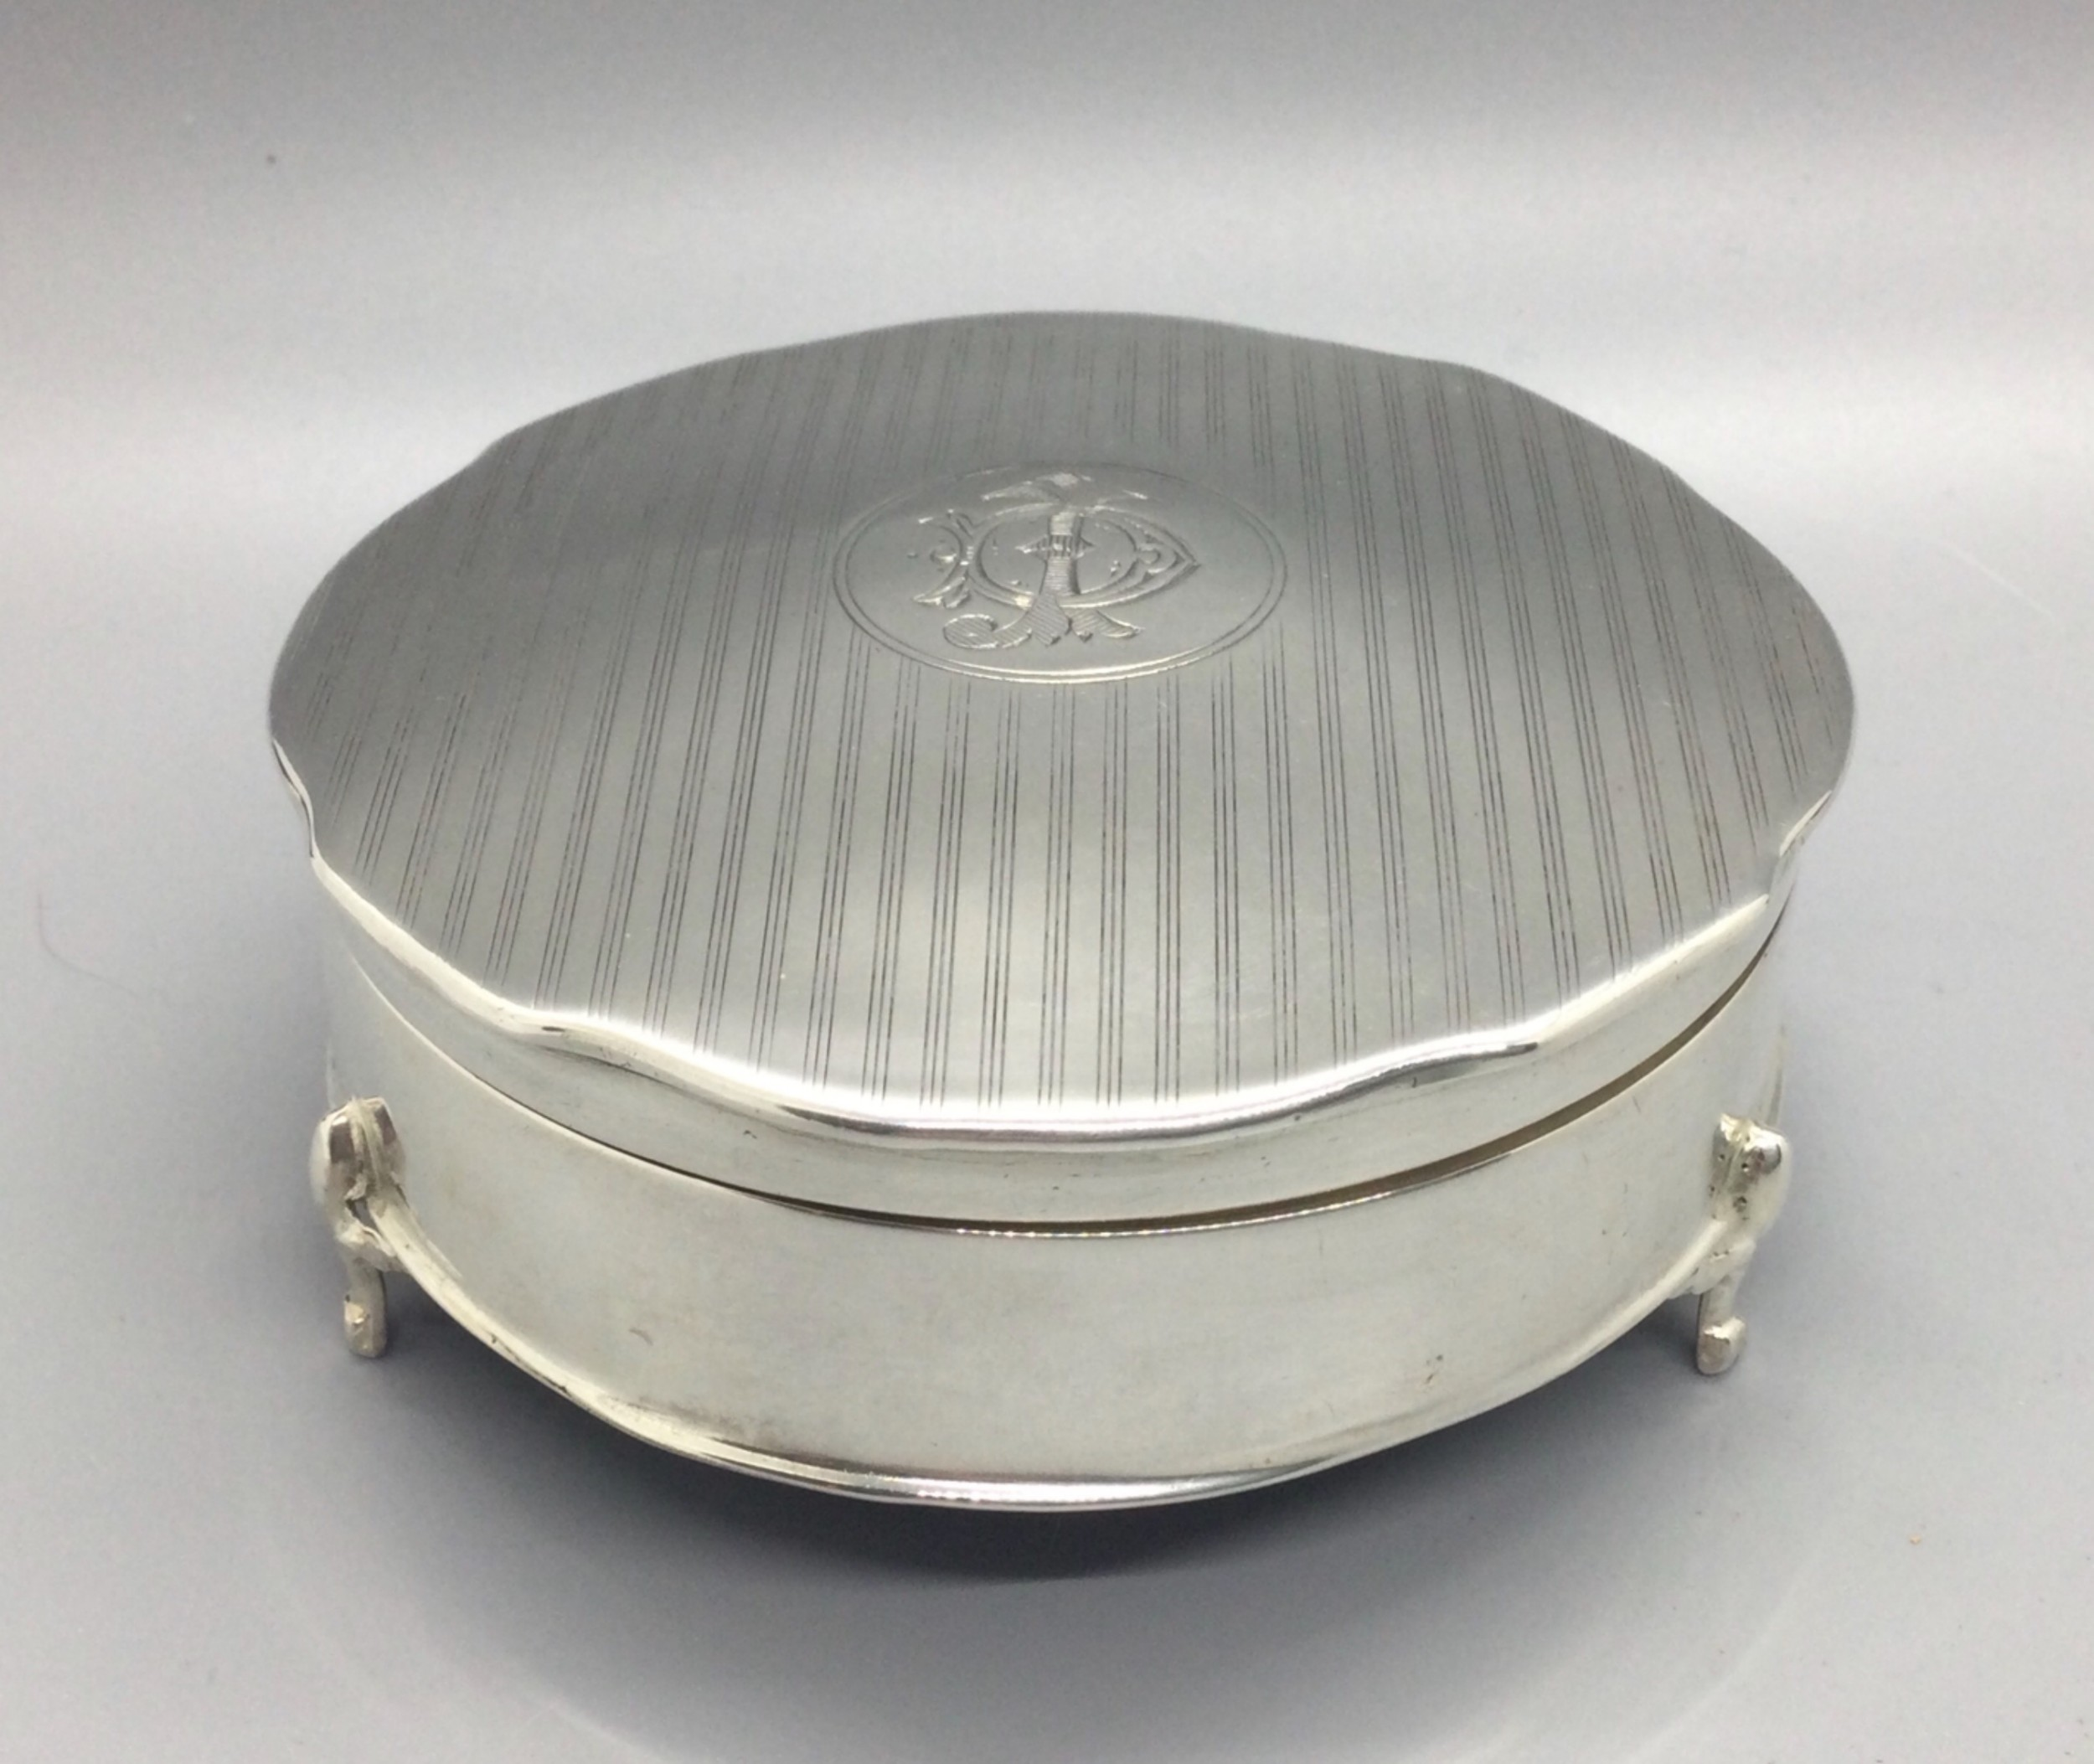 george v silver jewellery box birmingham 1913 elkington co